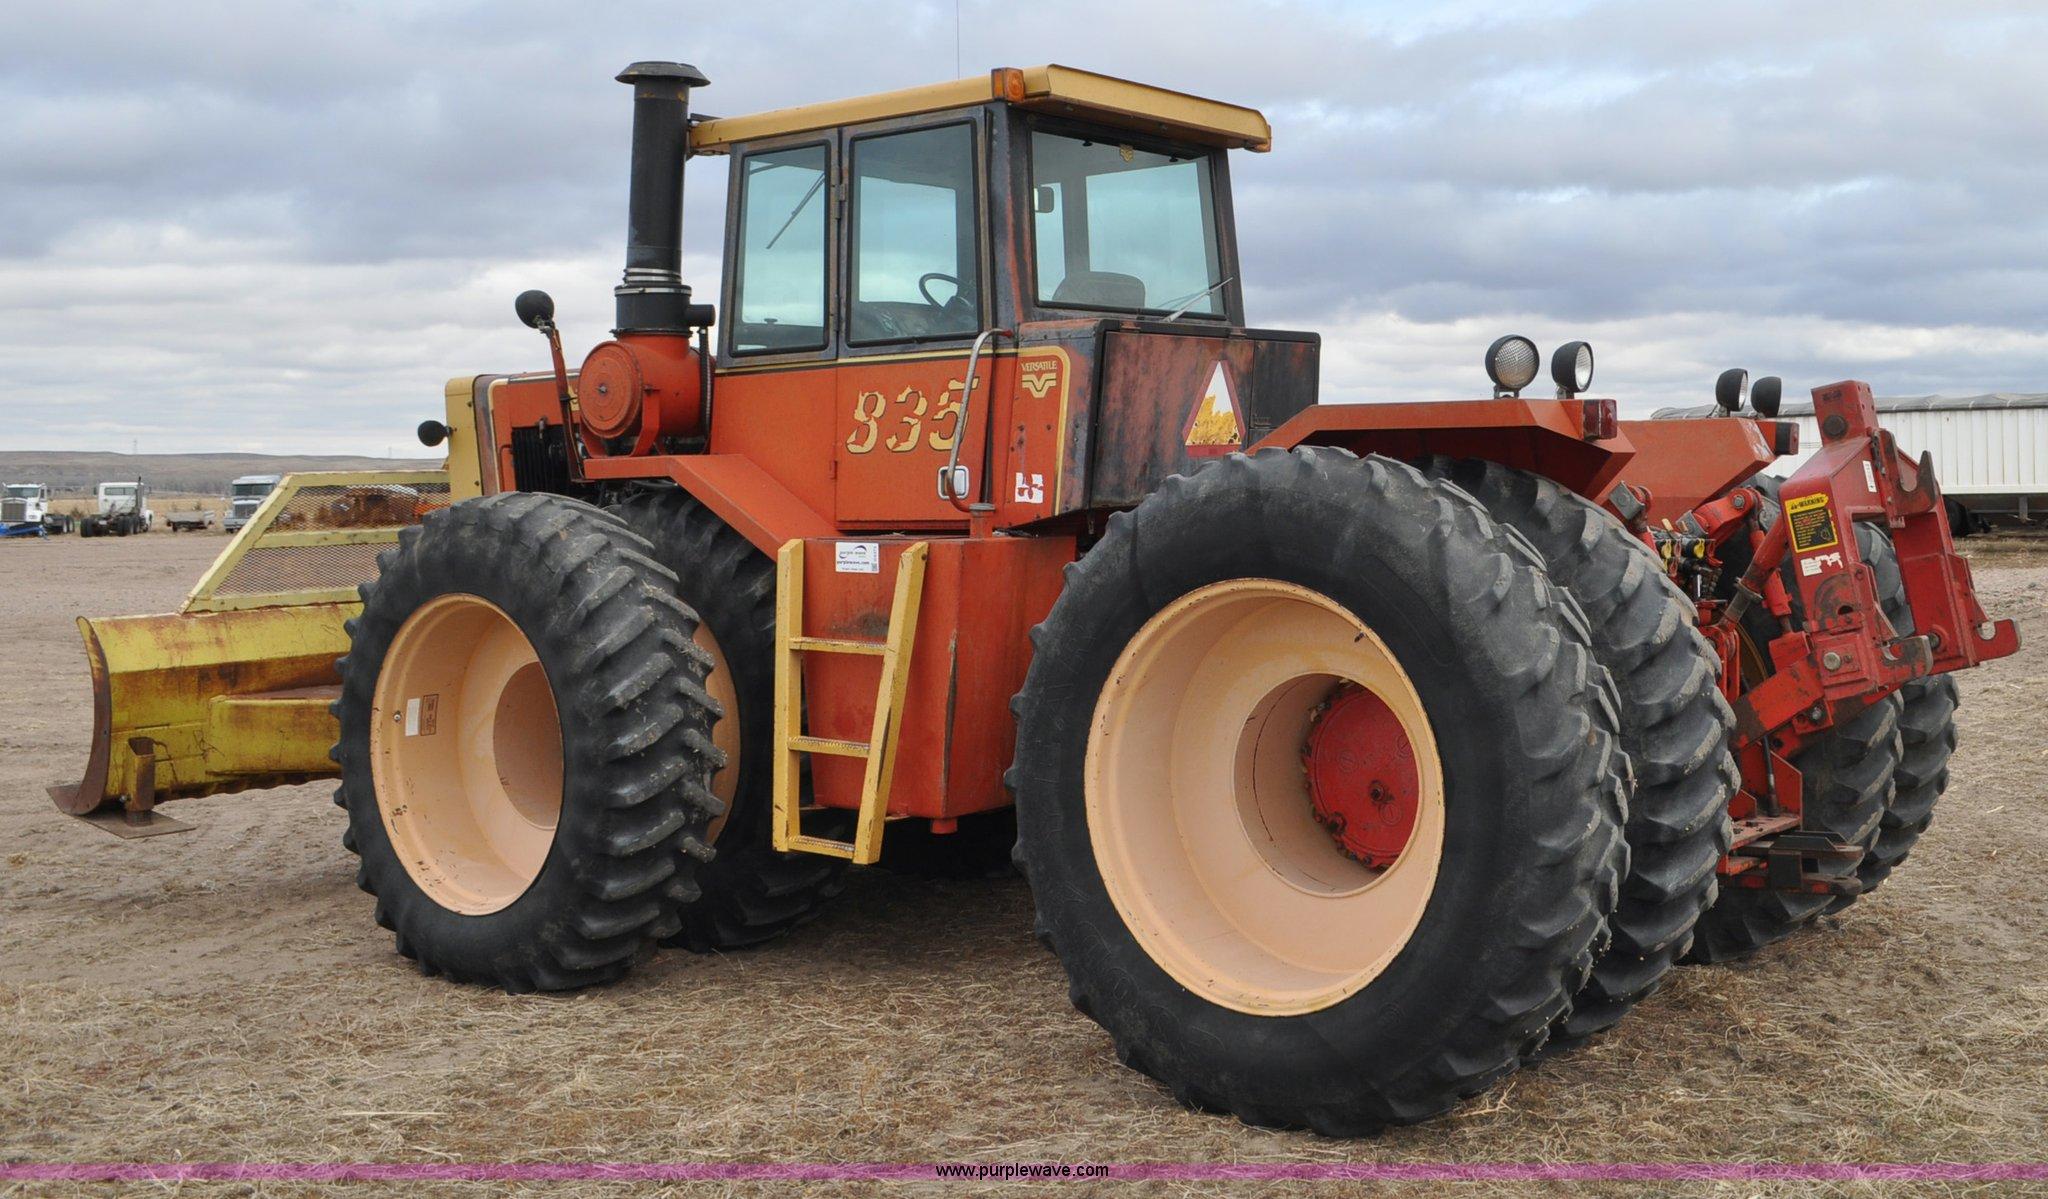 Versatile 835 Tractor Wiring Diagram Full Size In New Window 2048x1199